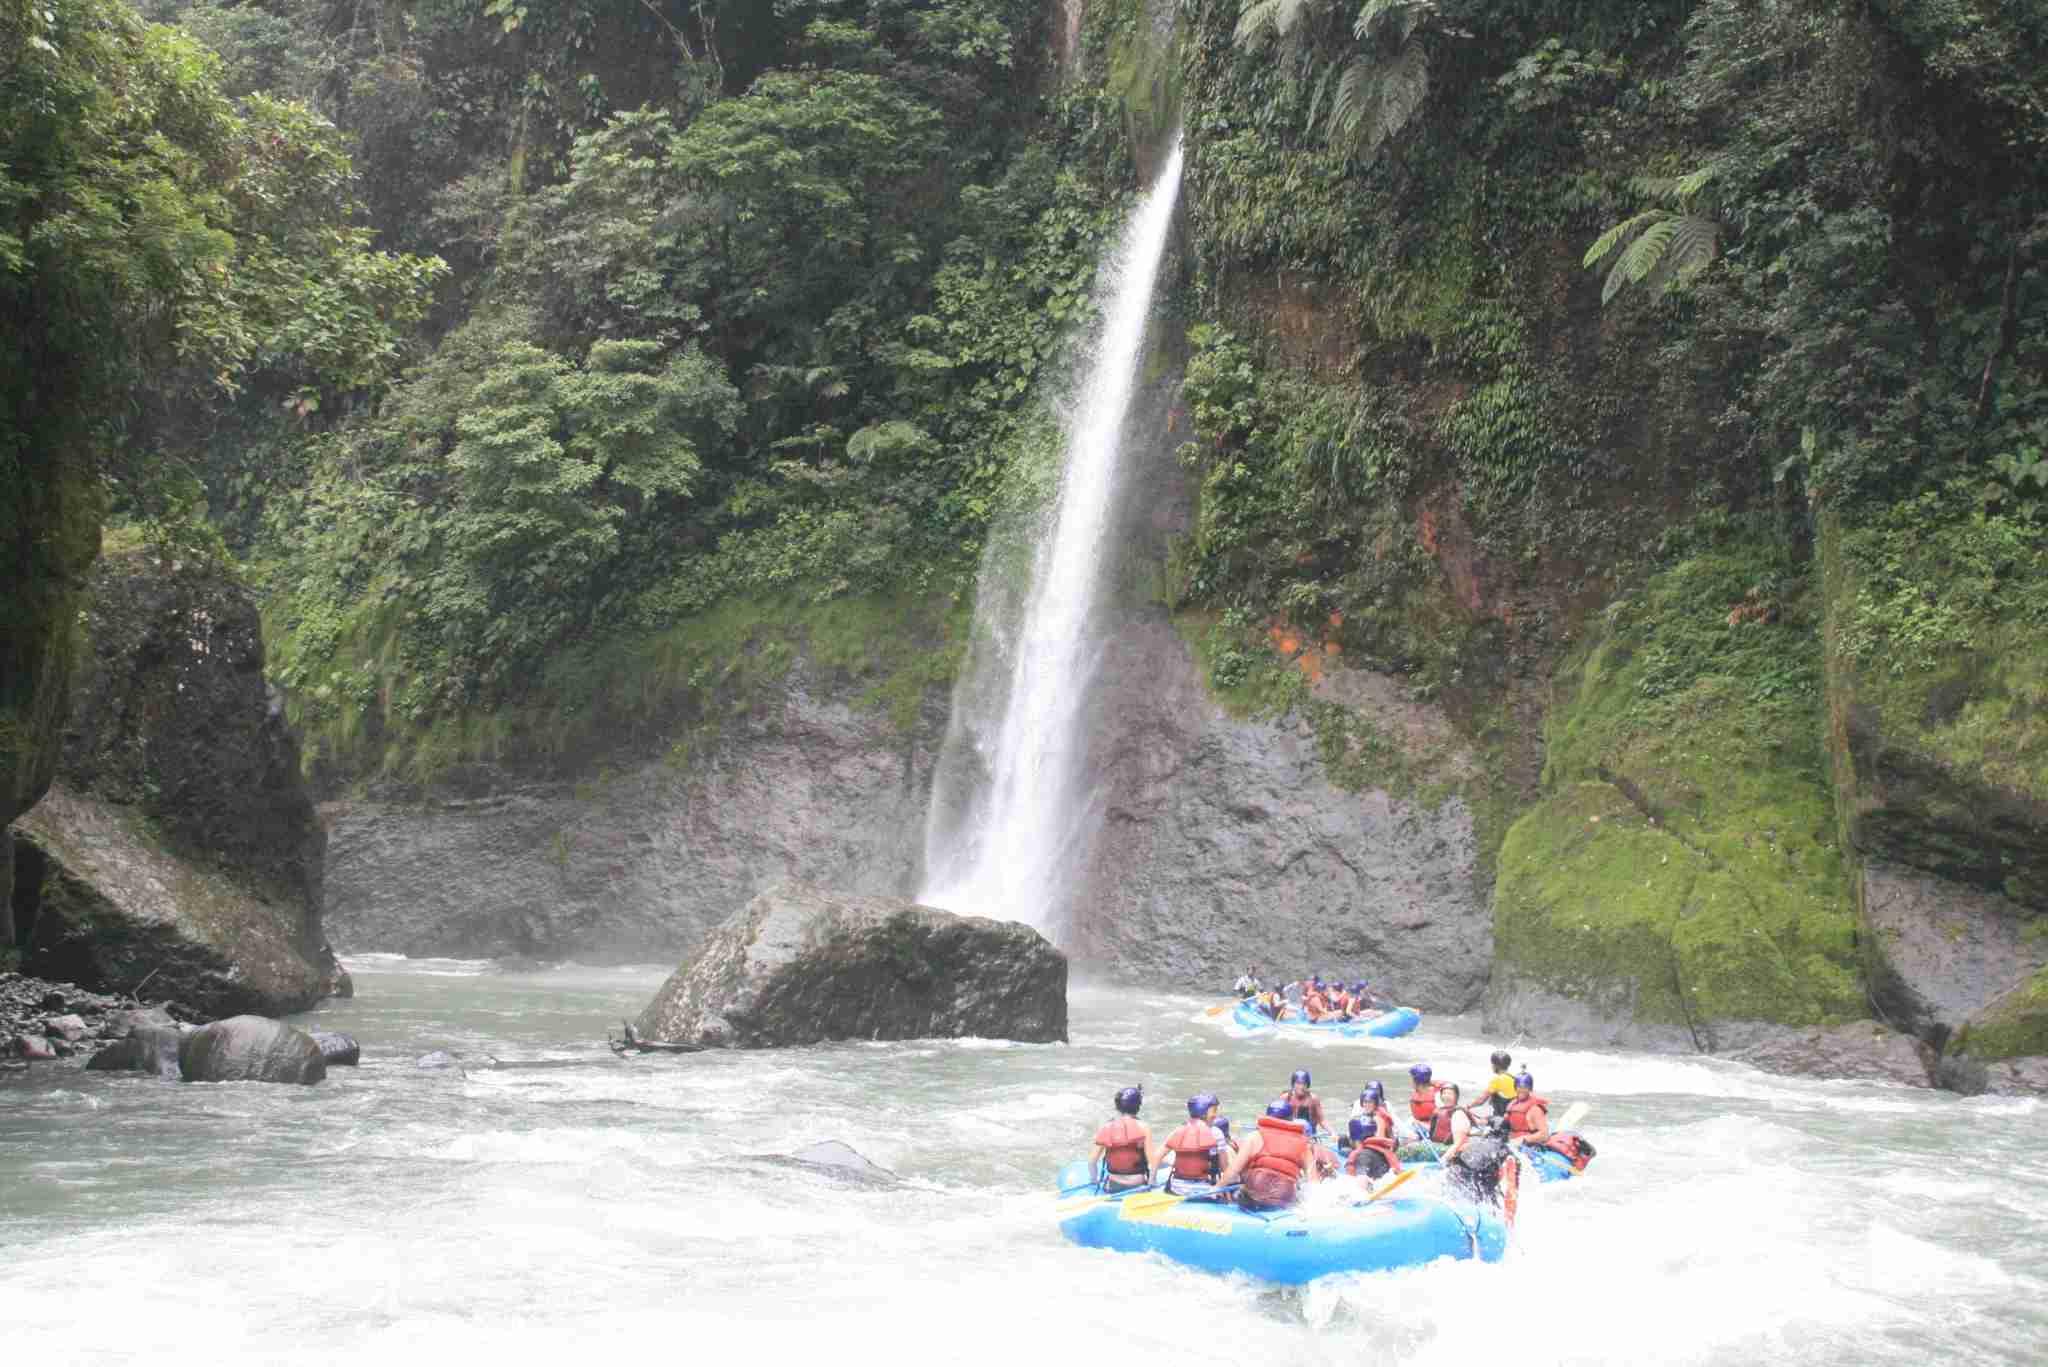 Rafting on Costa Rica